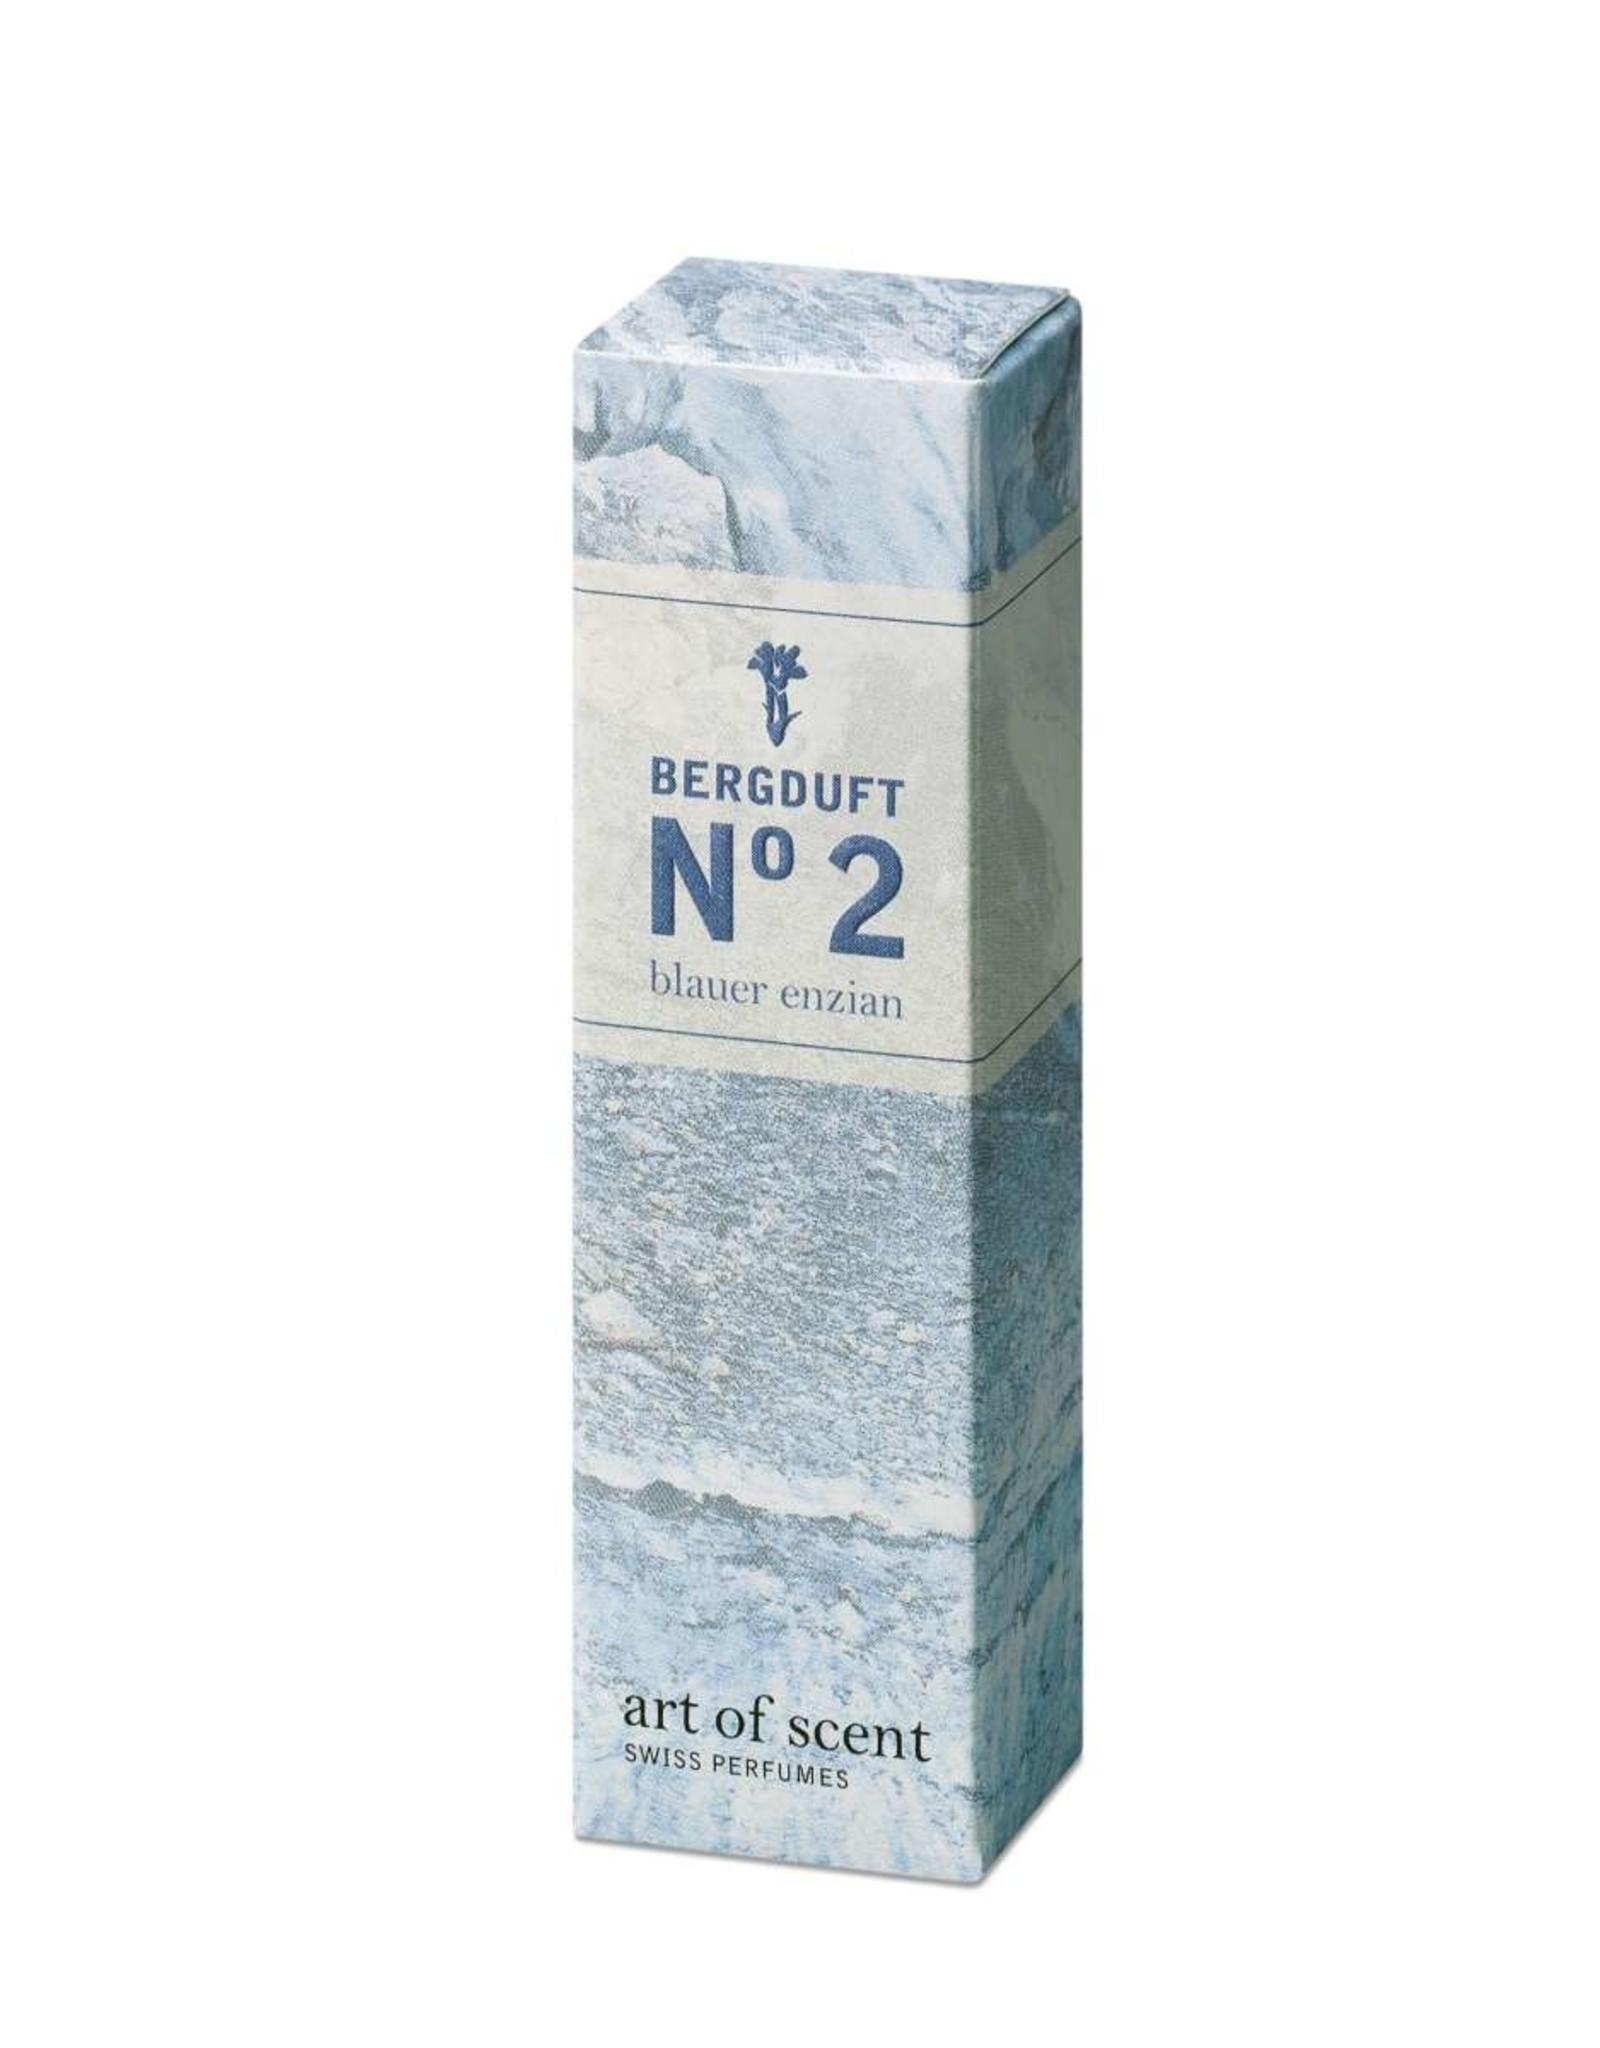 Bergduft Eau de Parfum Rollon N° 2 Blauer Enzian